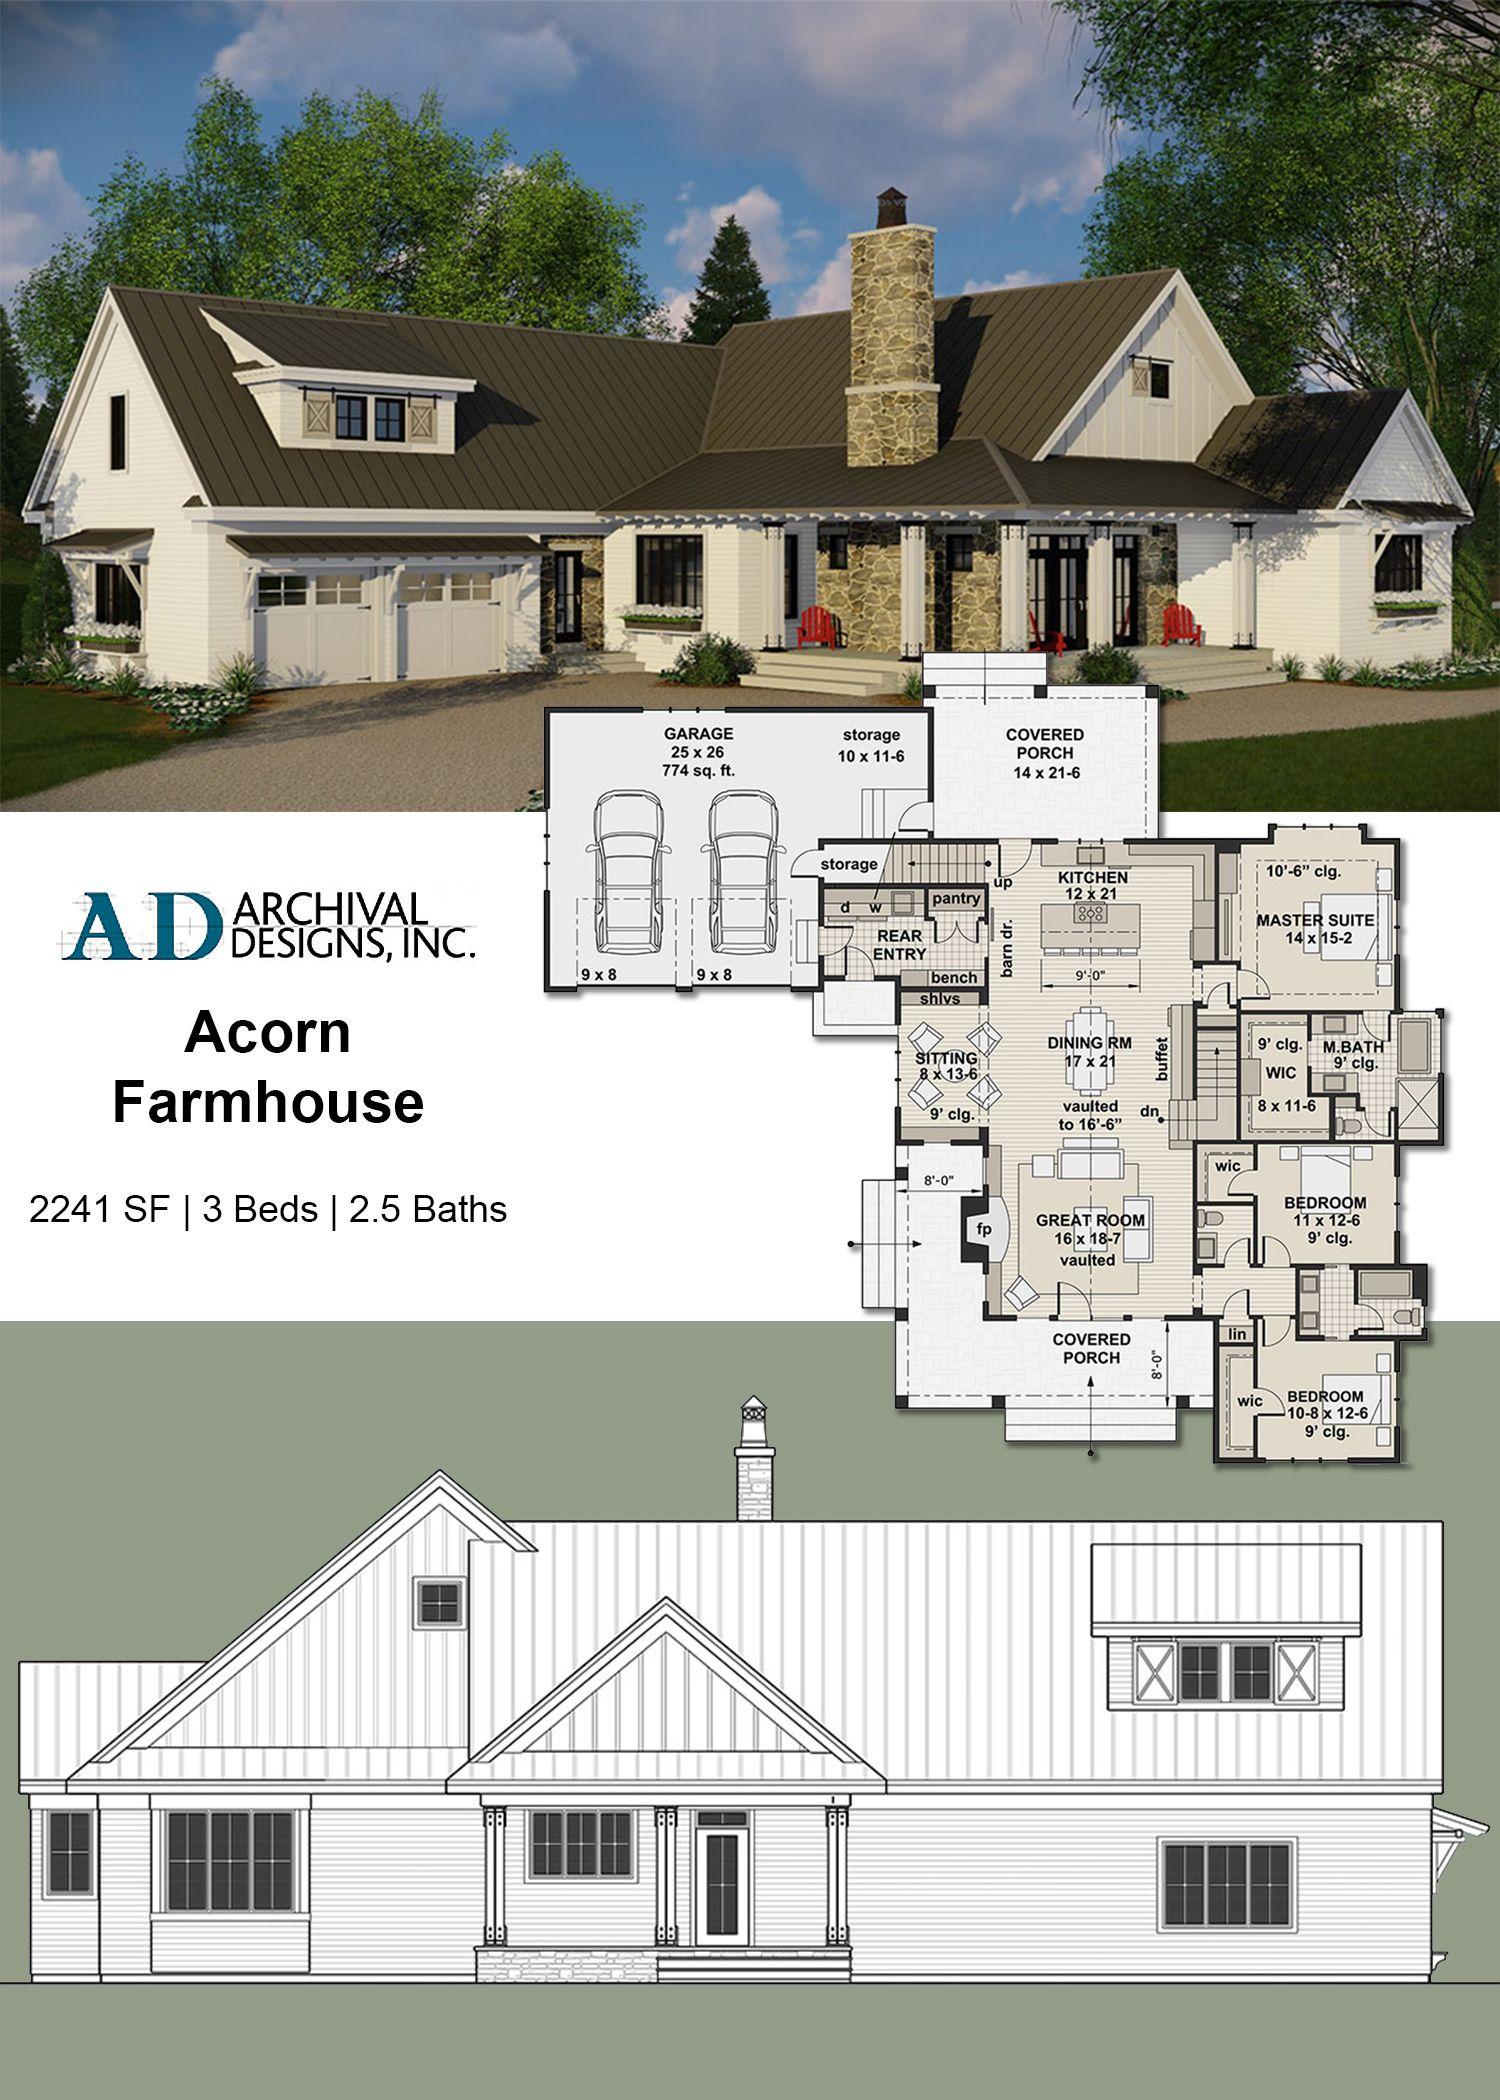 Acorn Farm House Plan